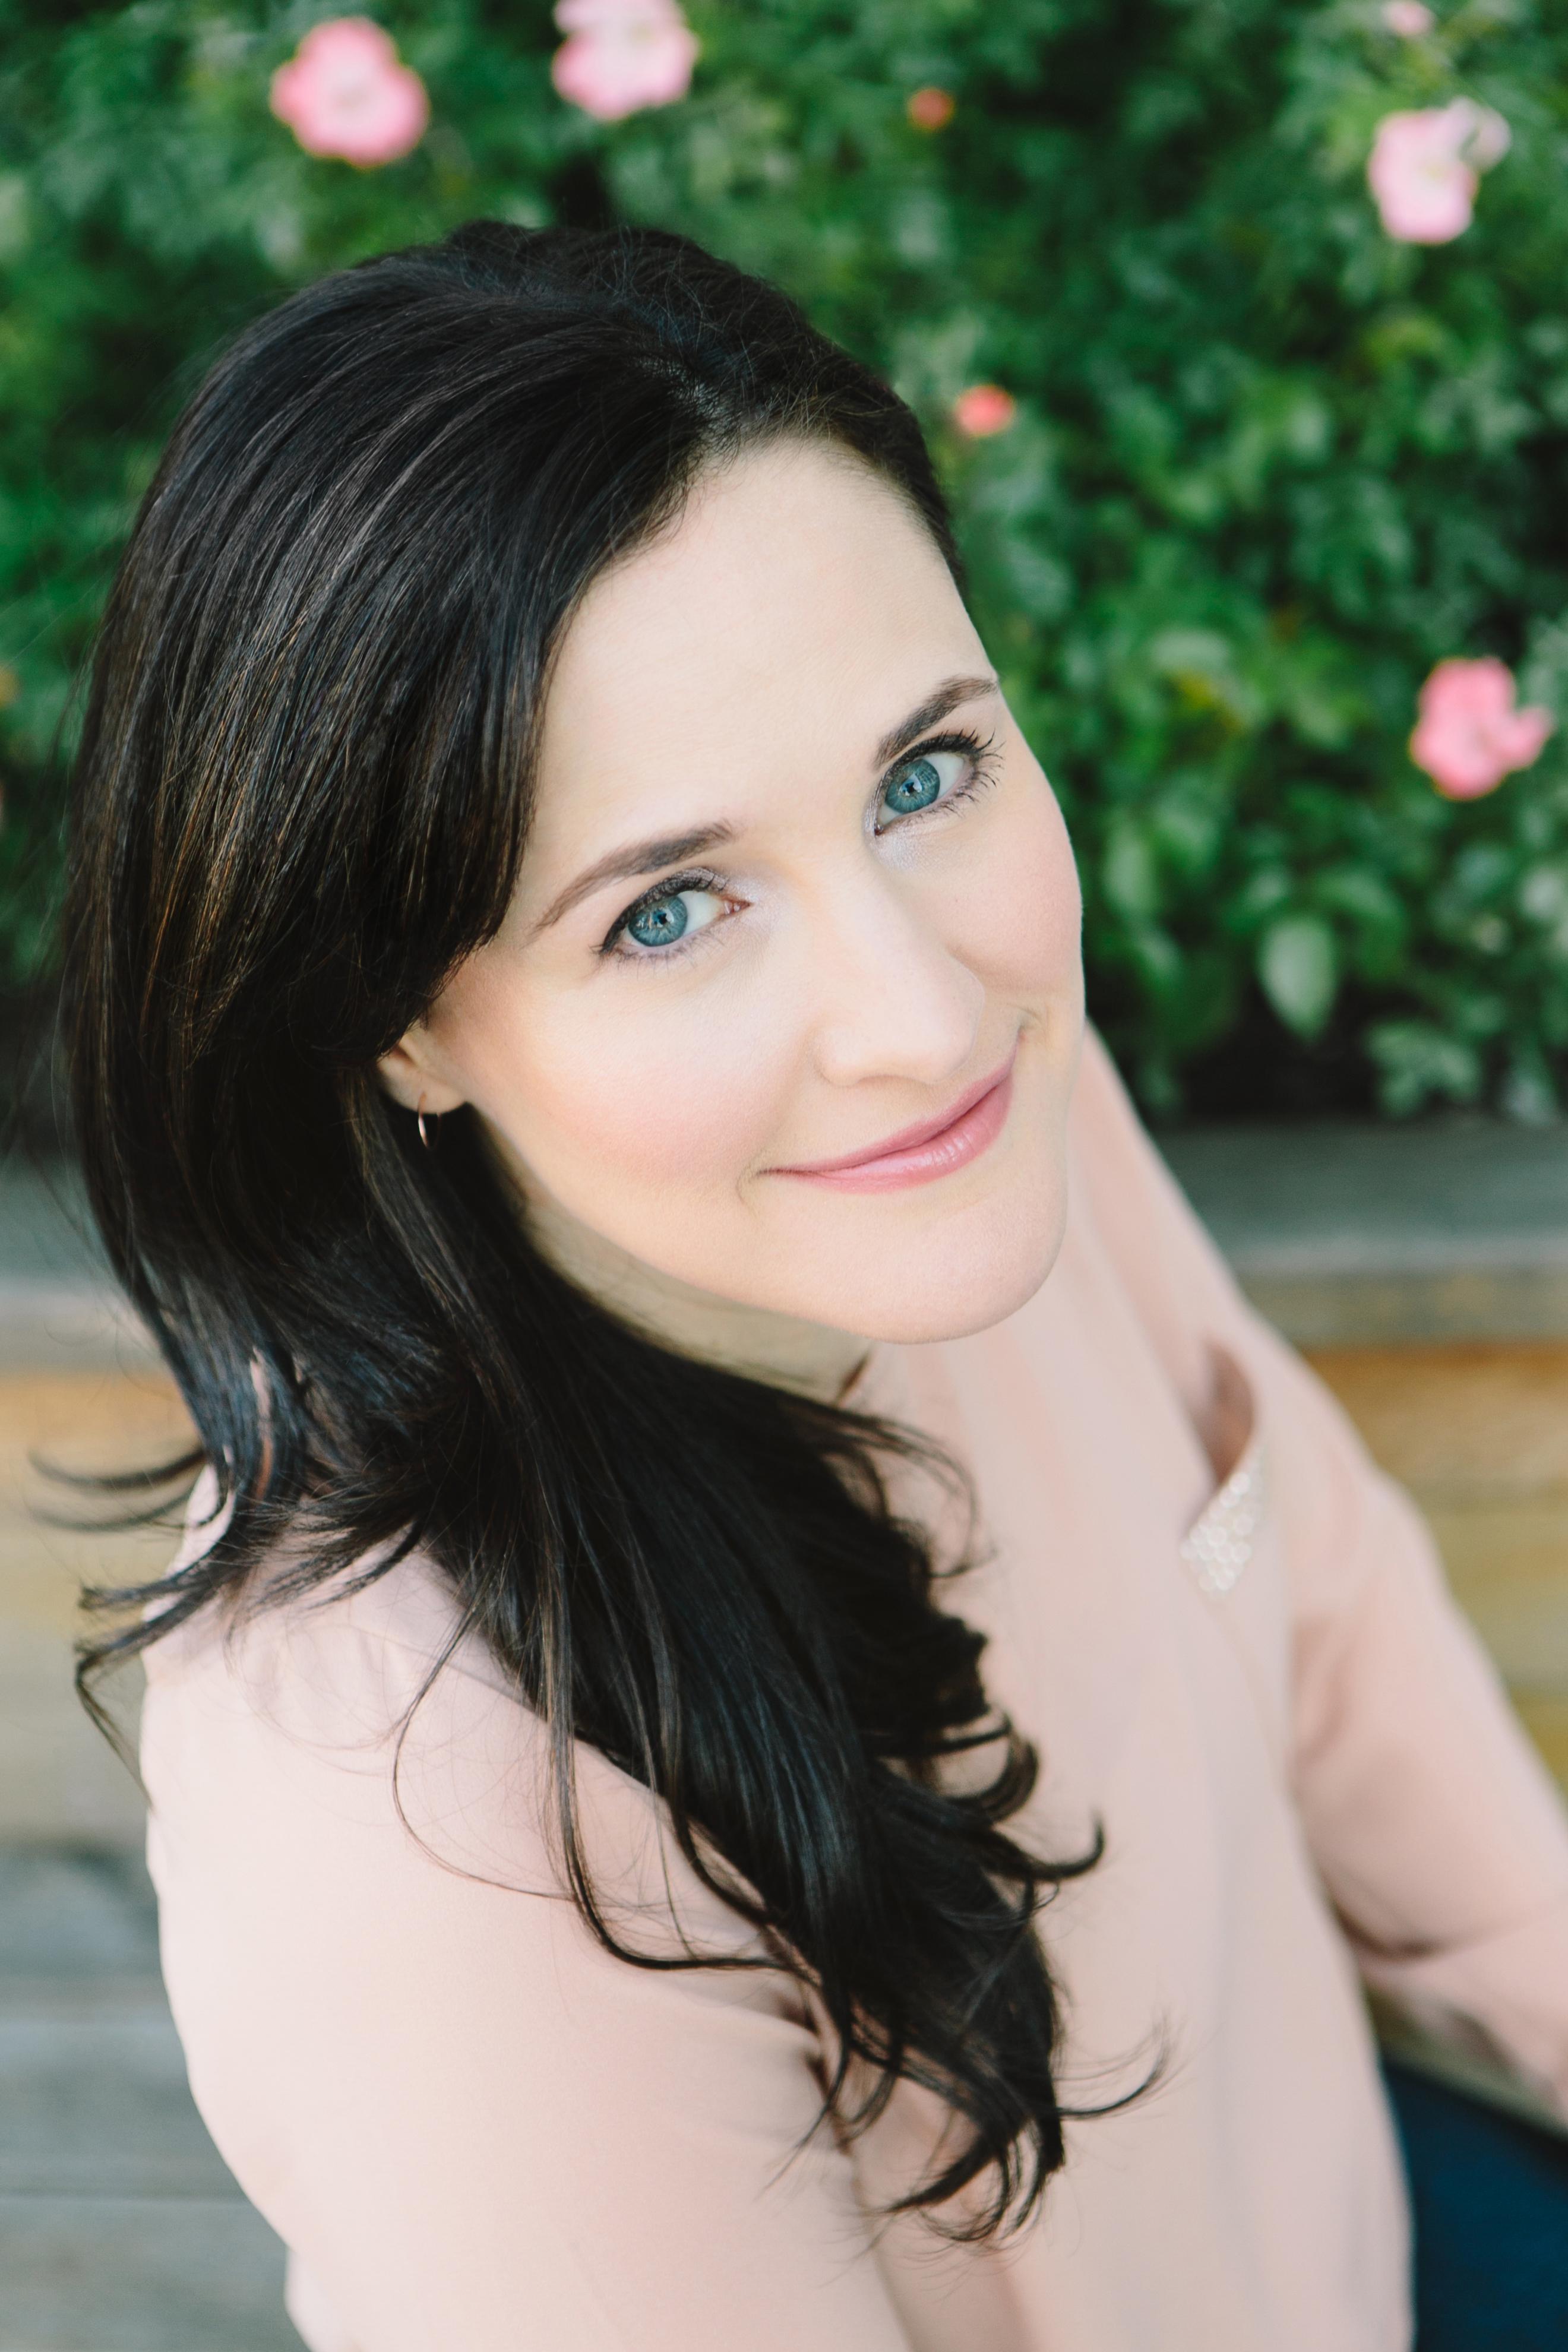 Sarah Mlynowski: Our 2014 Extreme Trivia Challenge Co-Host!